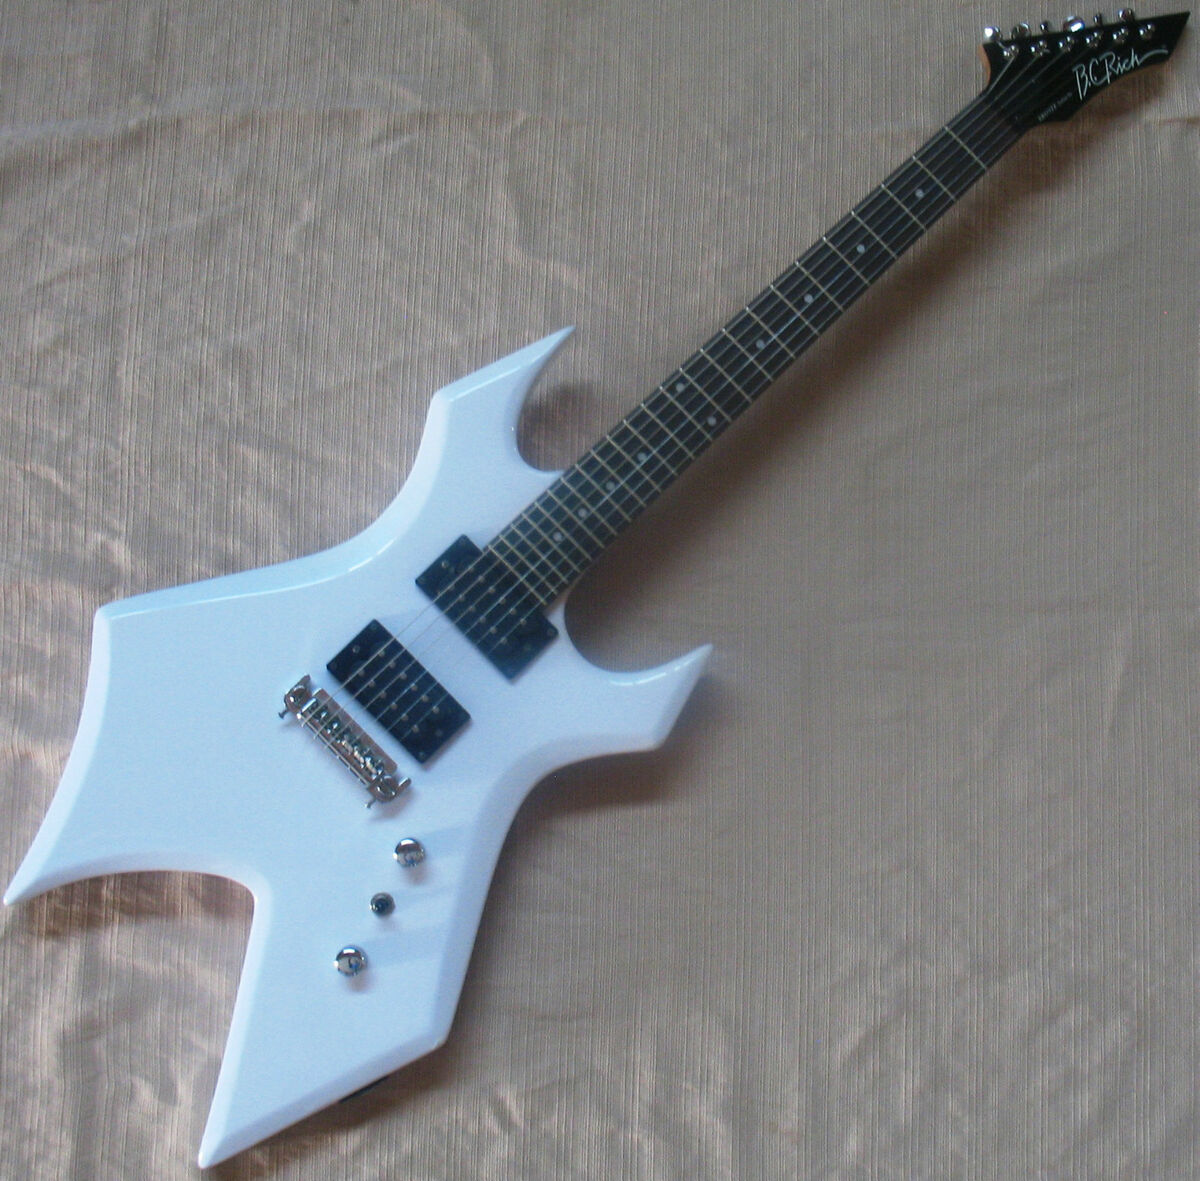 rich bronze series warlock electric guitar b c white ernie ball string. Black Bedroom Furniture Sets. Home Design Ideas